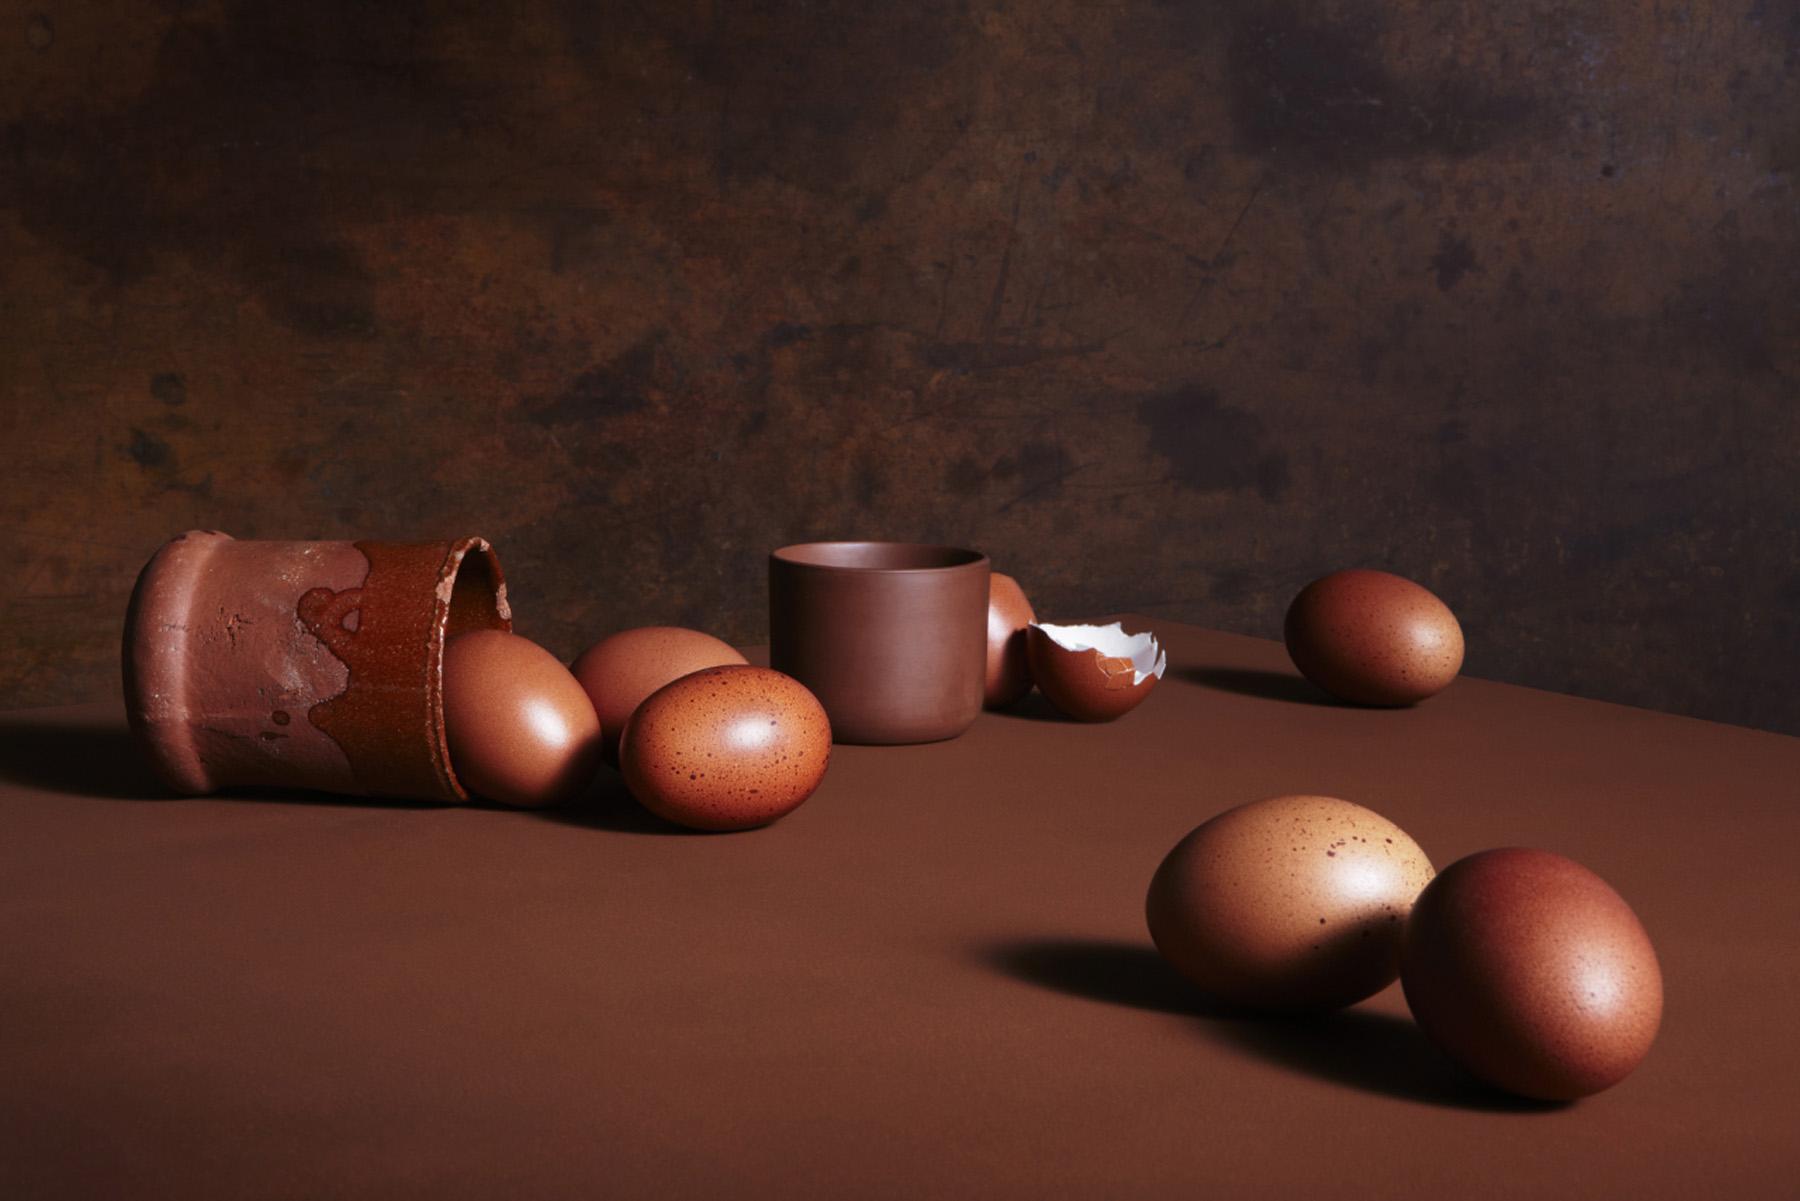 15-icon-artist-management-katie-hammond-food-icon-artist-management-katie-hammond-food-brown_exploration_of_eggs_ret_web.jpg